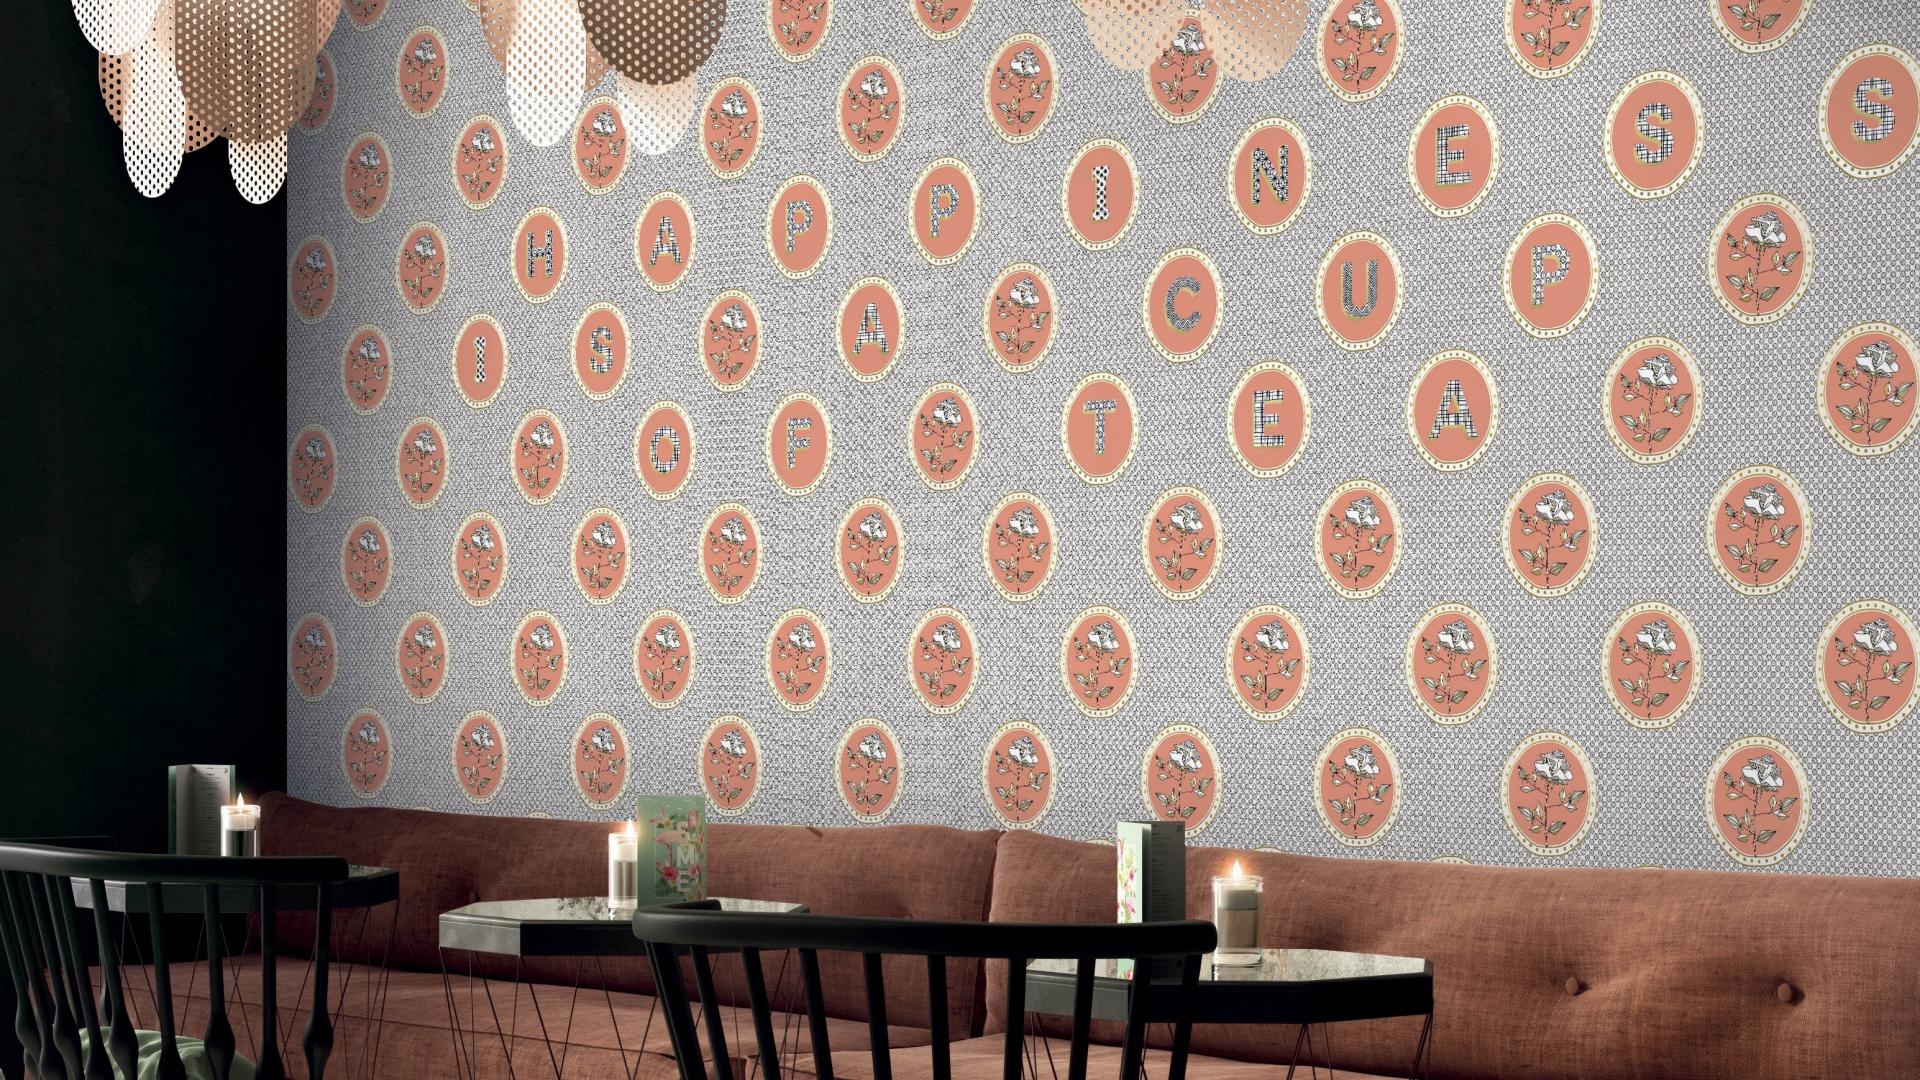 Wide Style Ceramic Wallpaper Ceramic Wallpaper Large Porcelain Slabs Designed By Abk